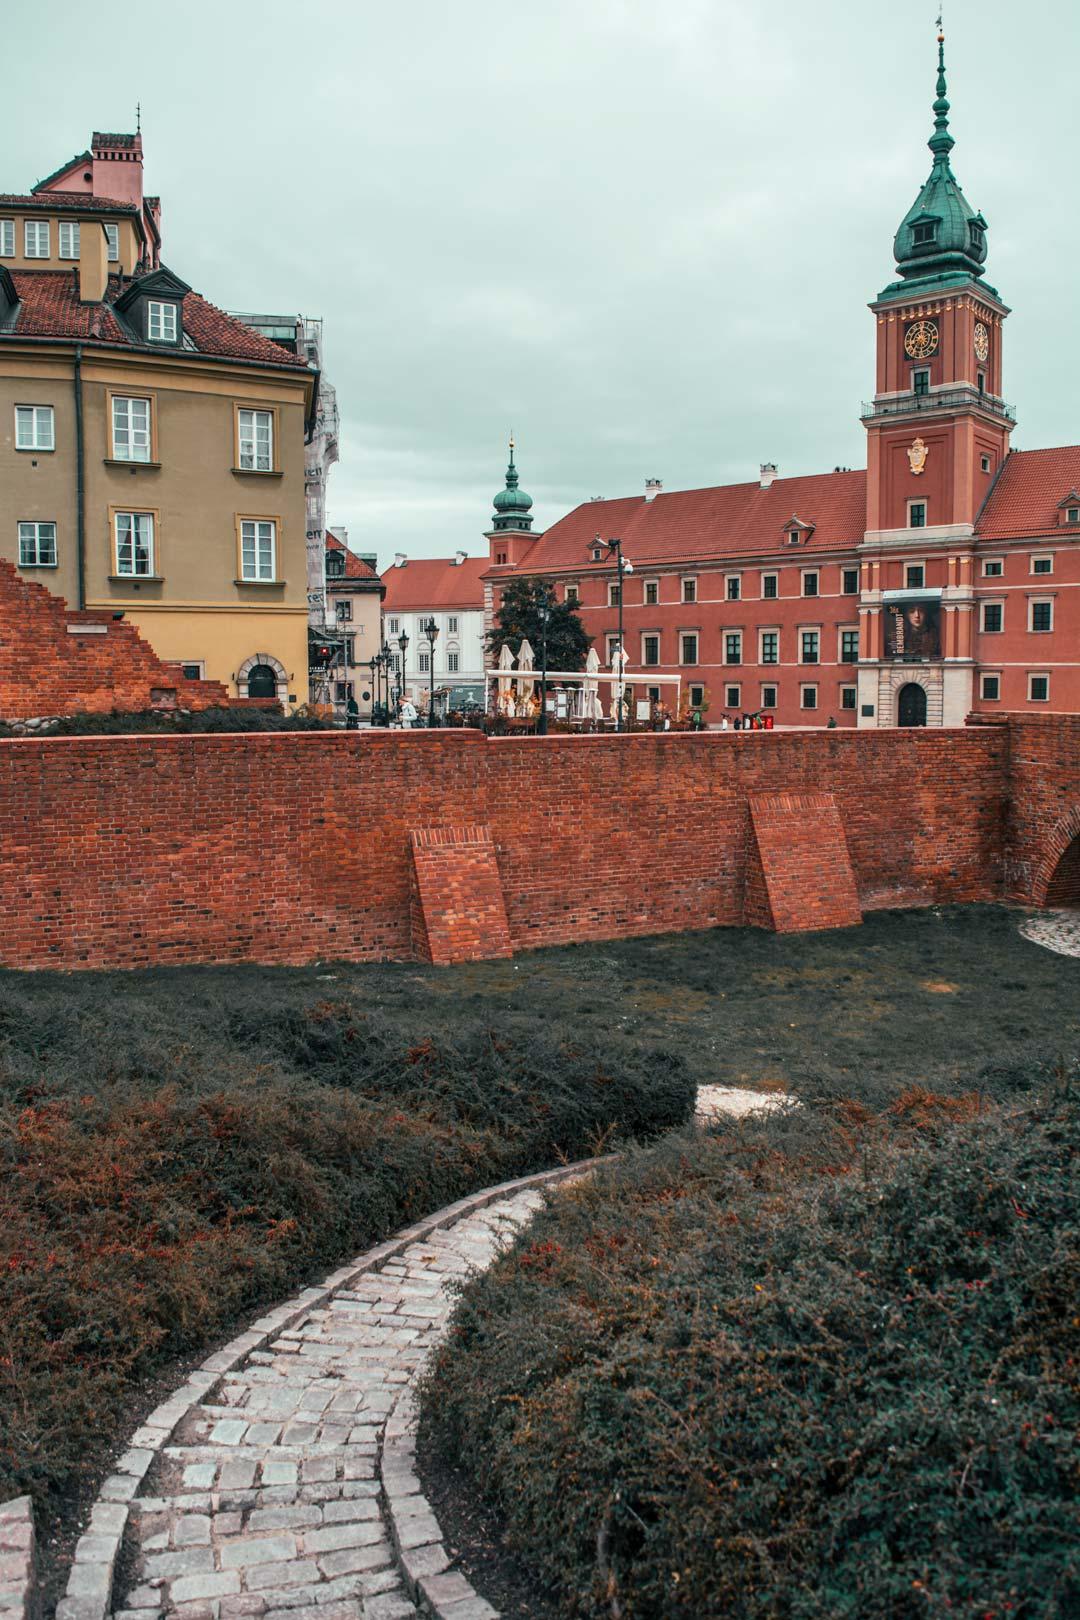 Warsaw-Βασιλικό-κάστρο-travelshare.gr